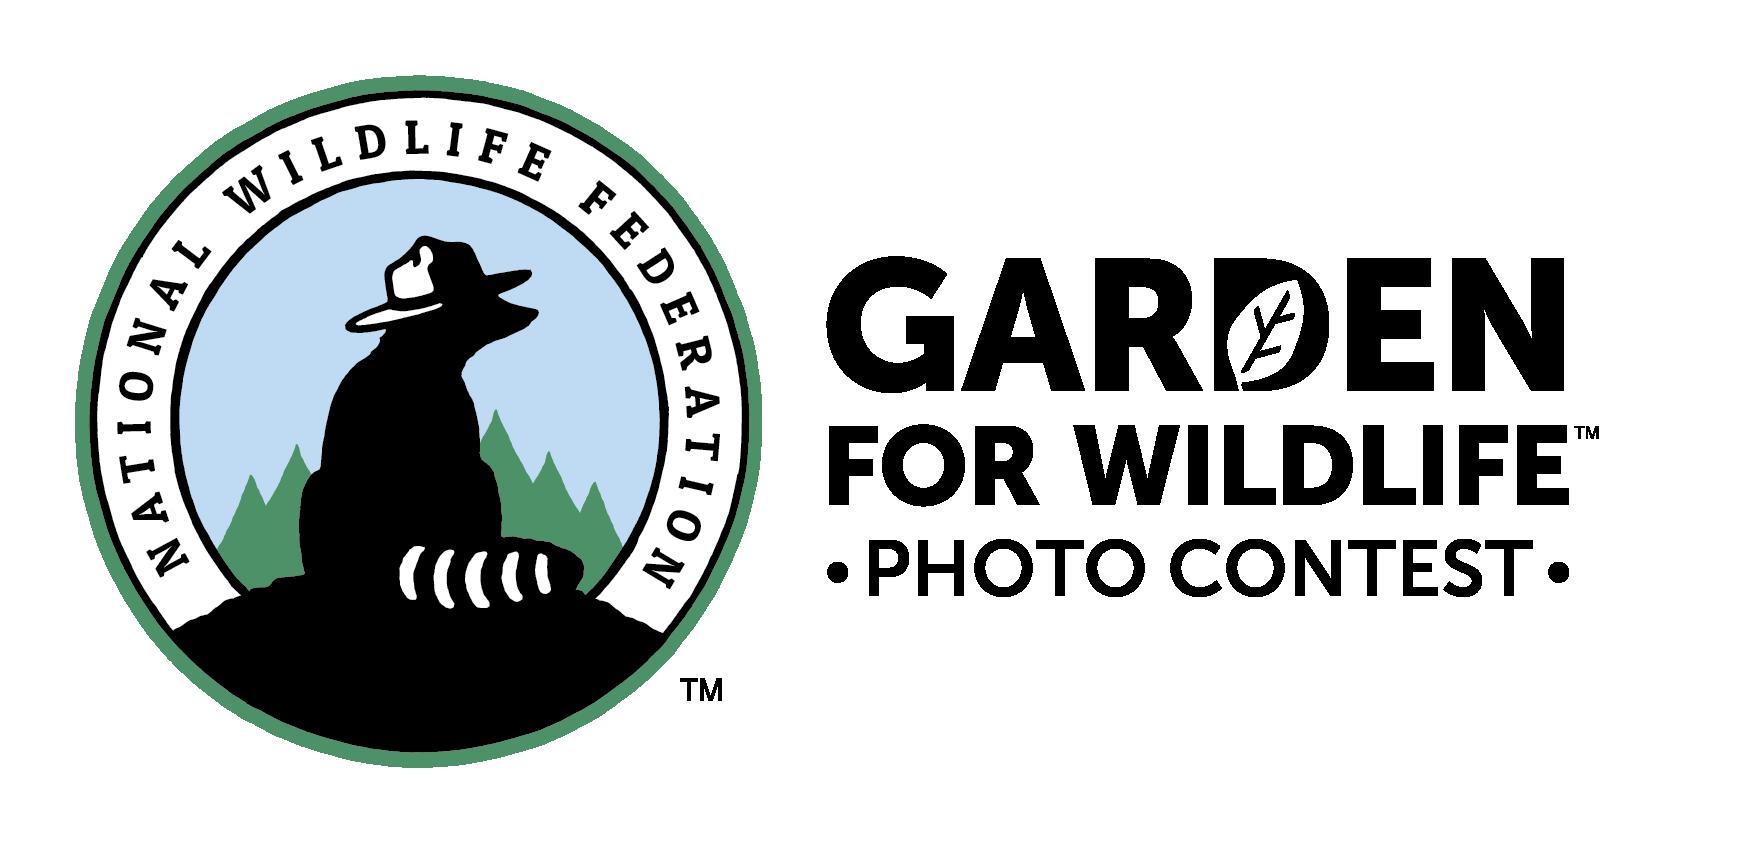 National Wildlife Federation's Garden for Wildlife Photo Contest - logo